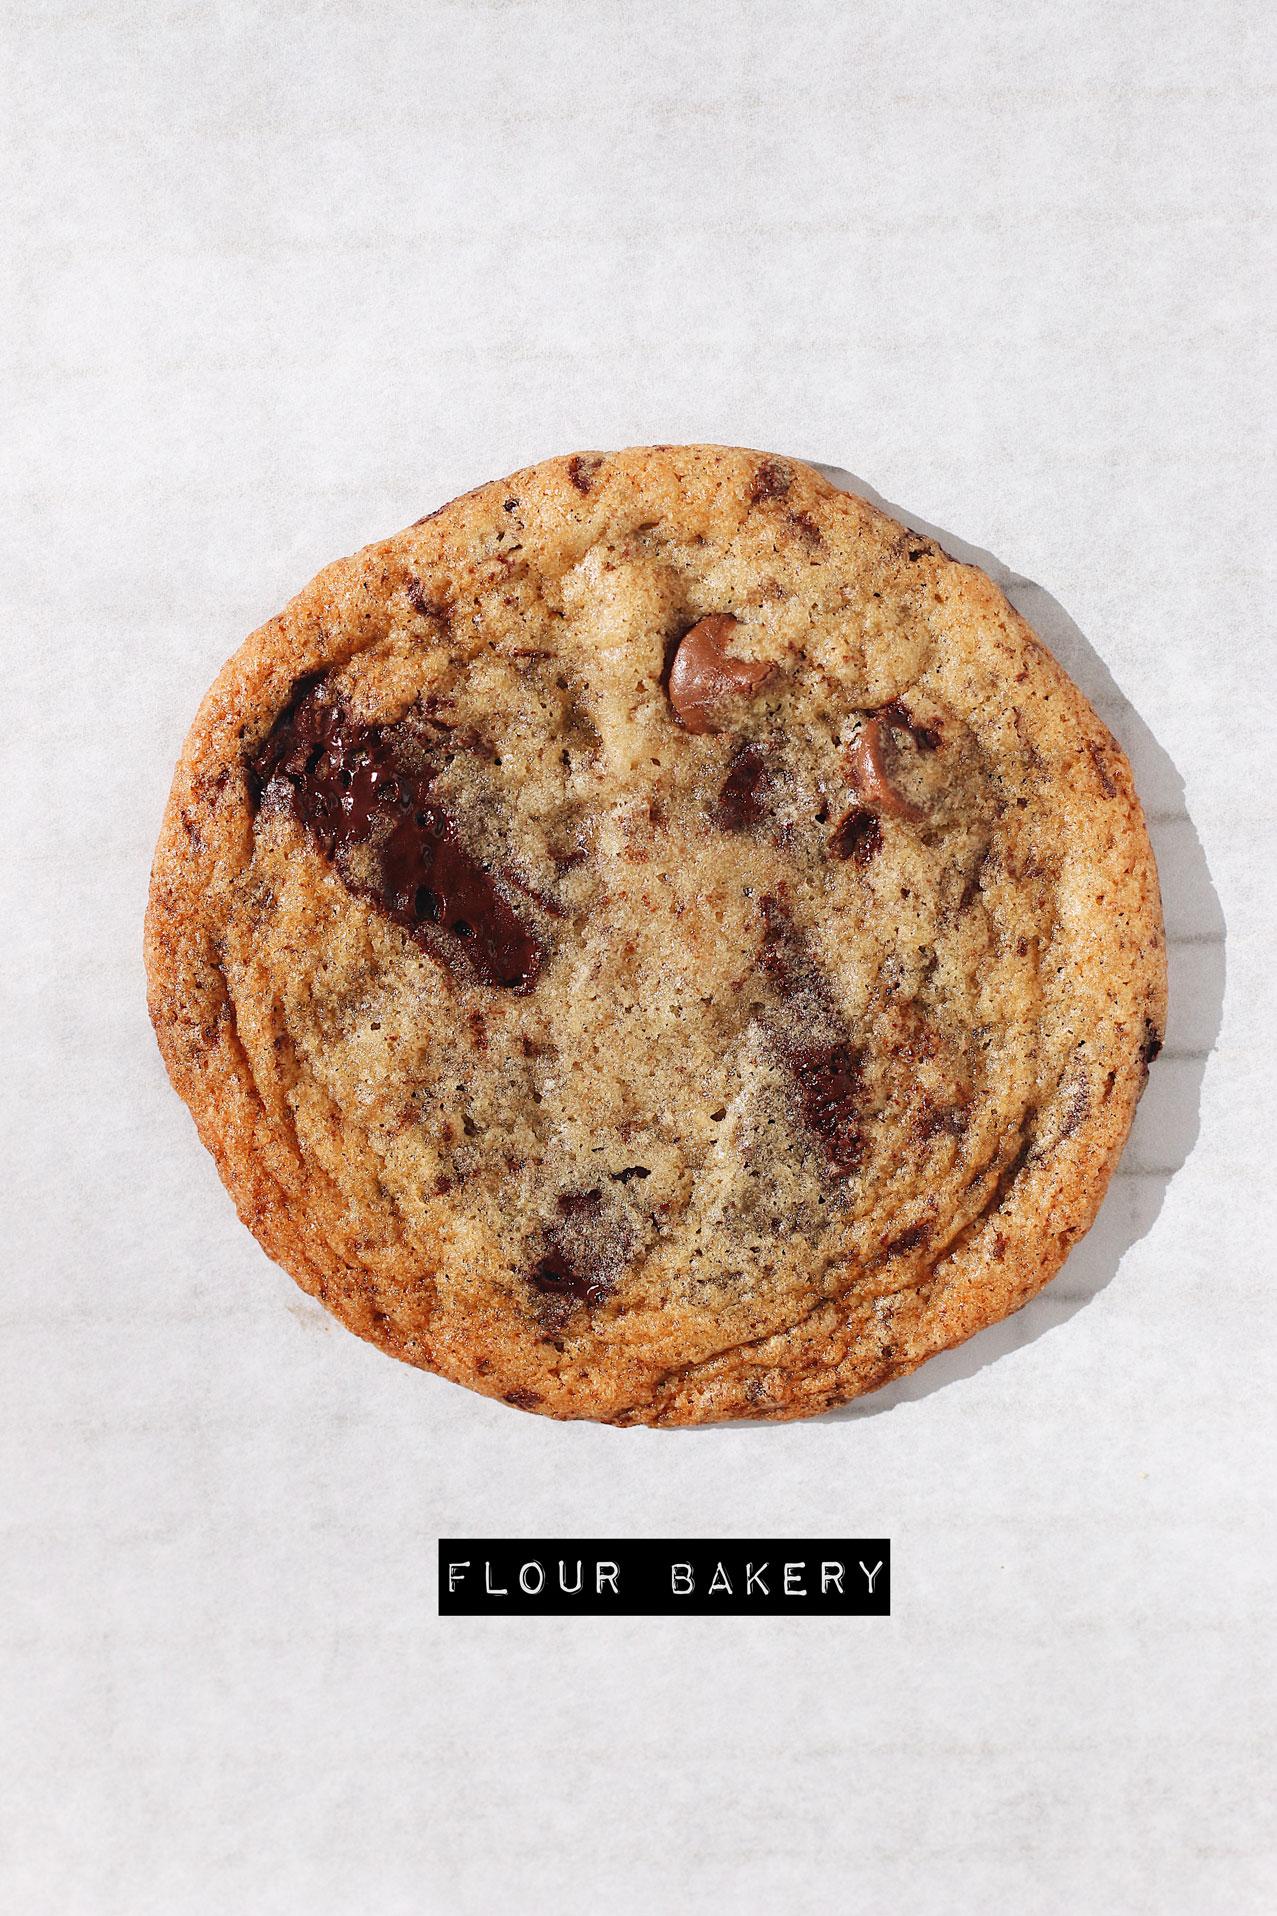 herbakinglab-best-chocolate-chip-cookie-bake-off-flour-bakery